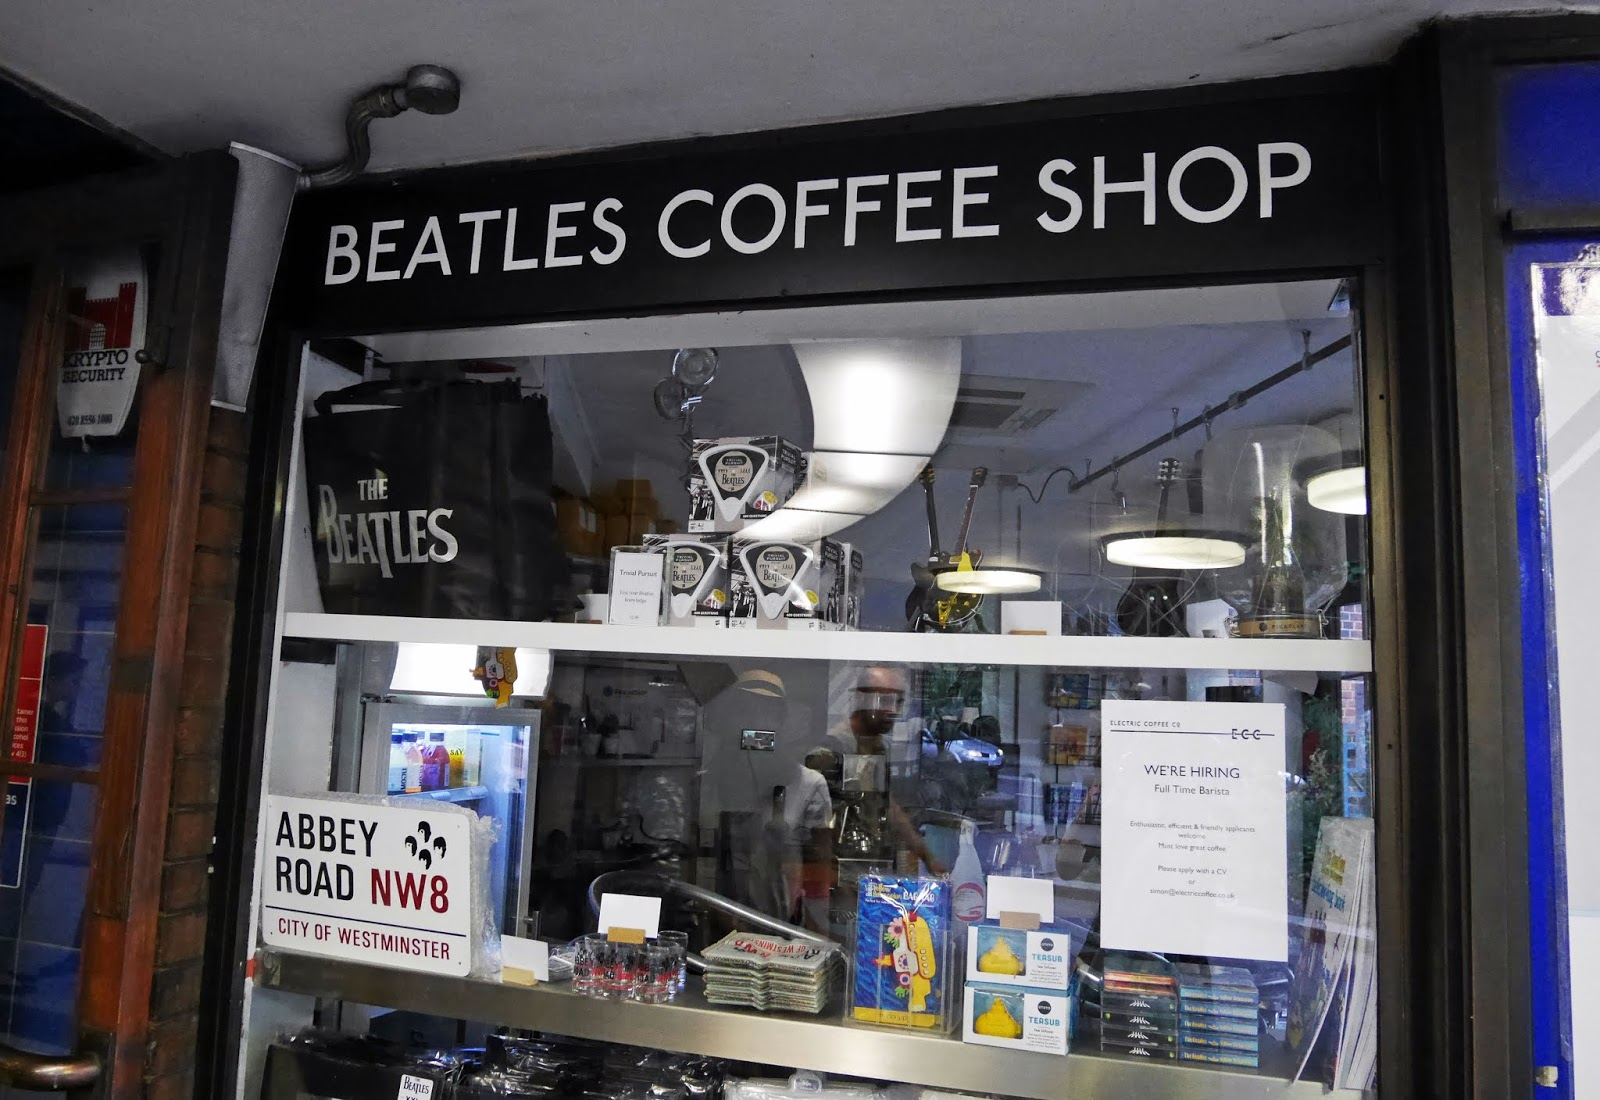 Beatles Coffee Shop at St John's Wood tube station near Abbey Road